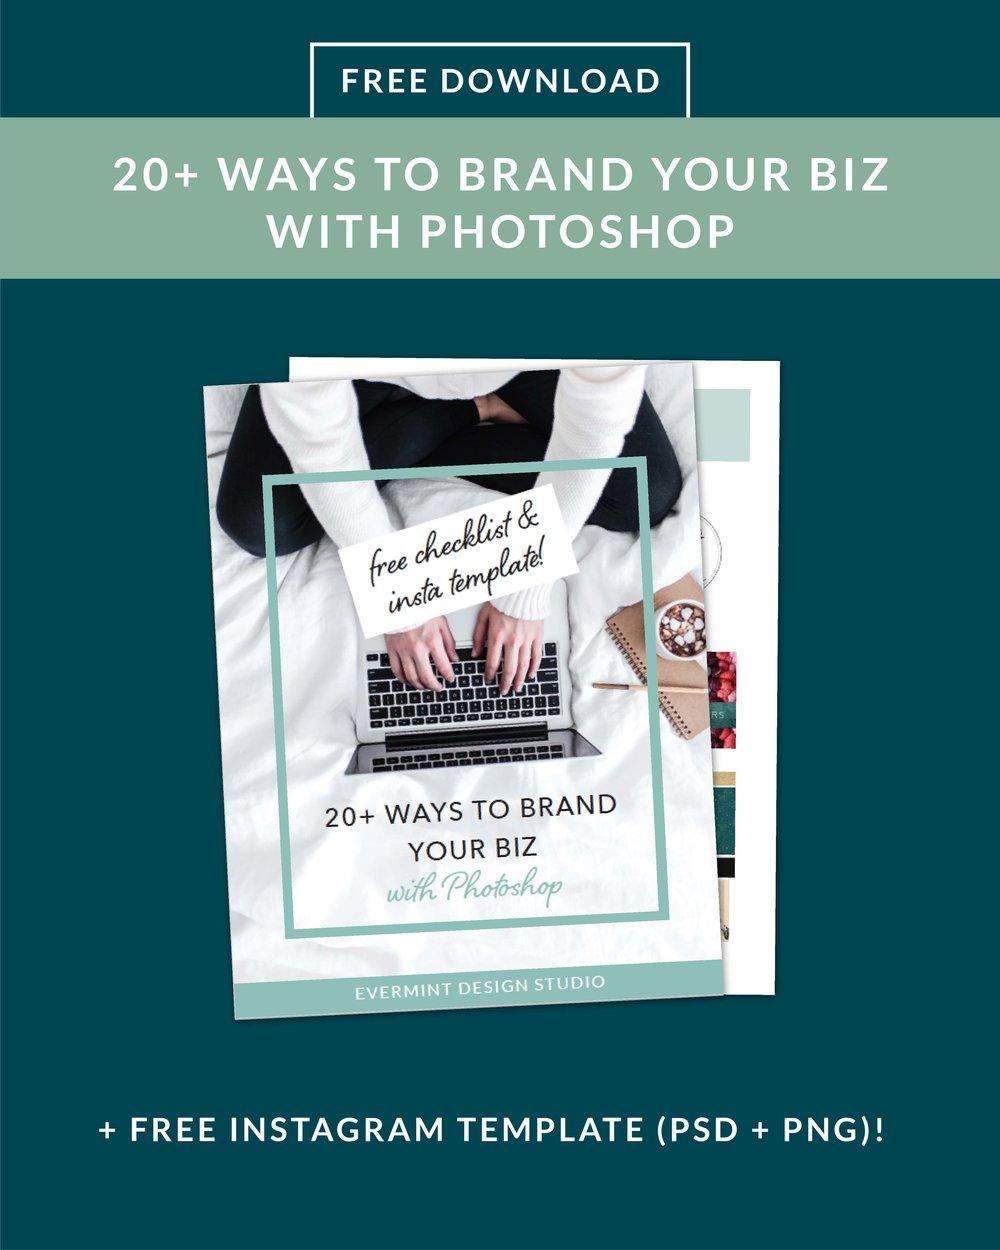 20 Ways to Brand Your Biz with Photoshop checklist